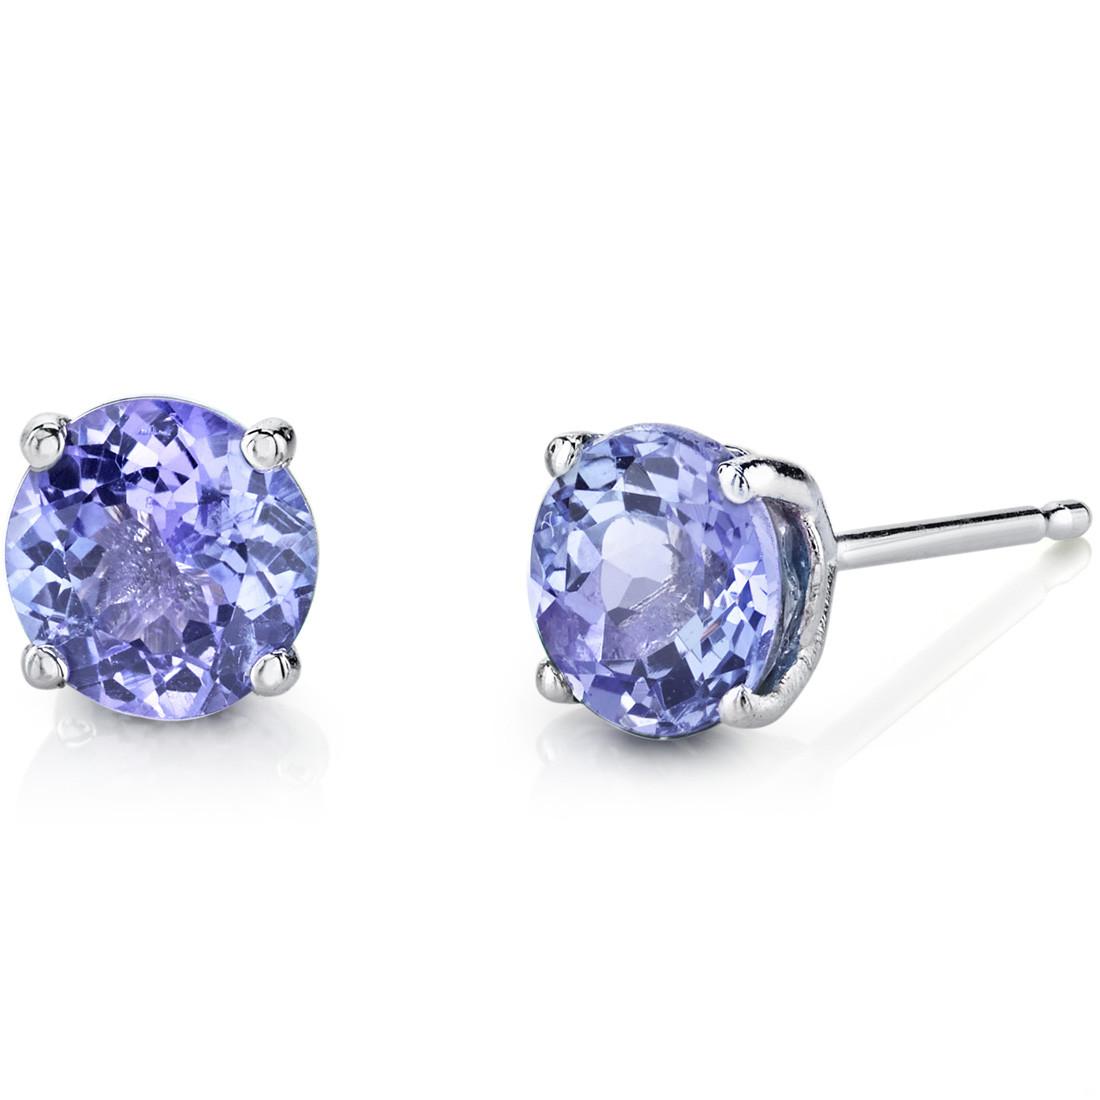 2 Carat Tanzanite /& Diamond Round Stud Earrings White Gold Silver